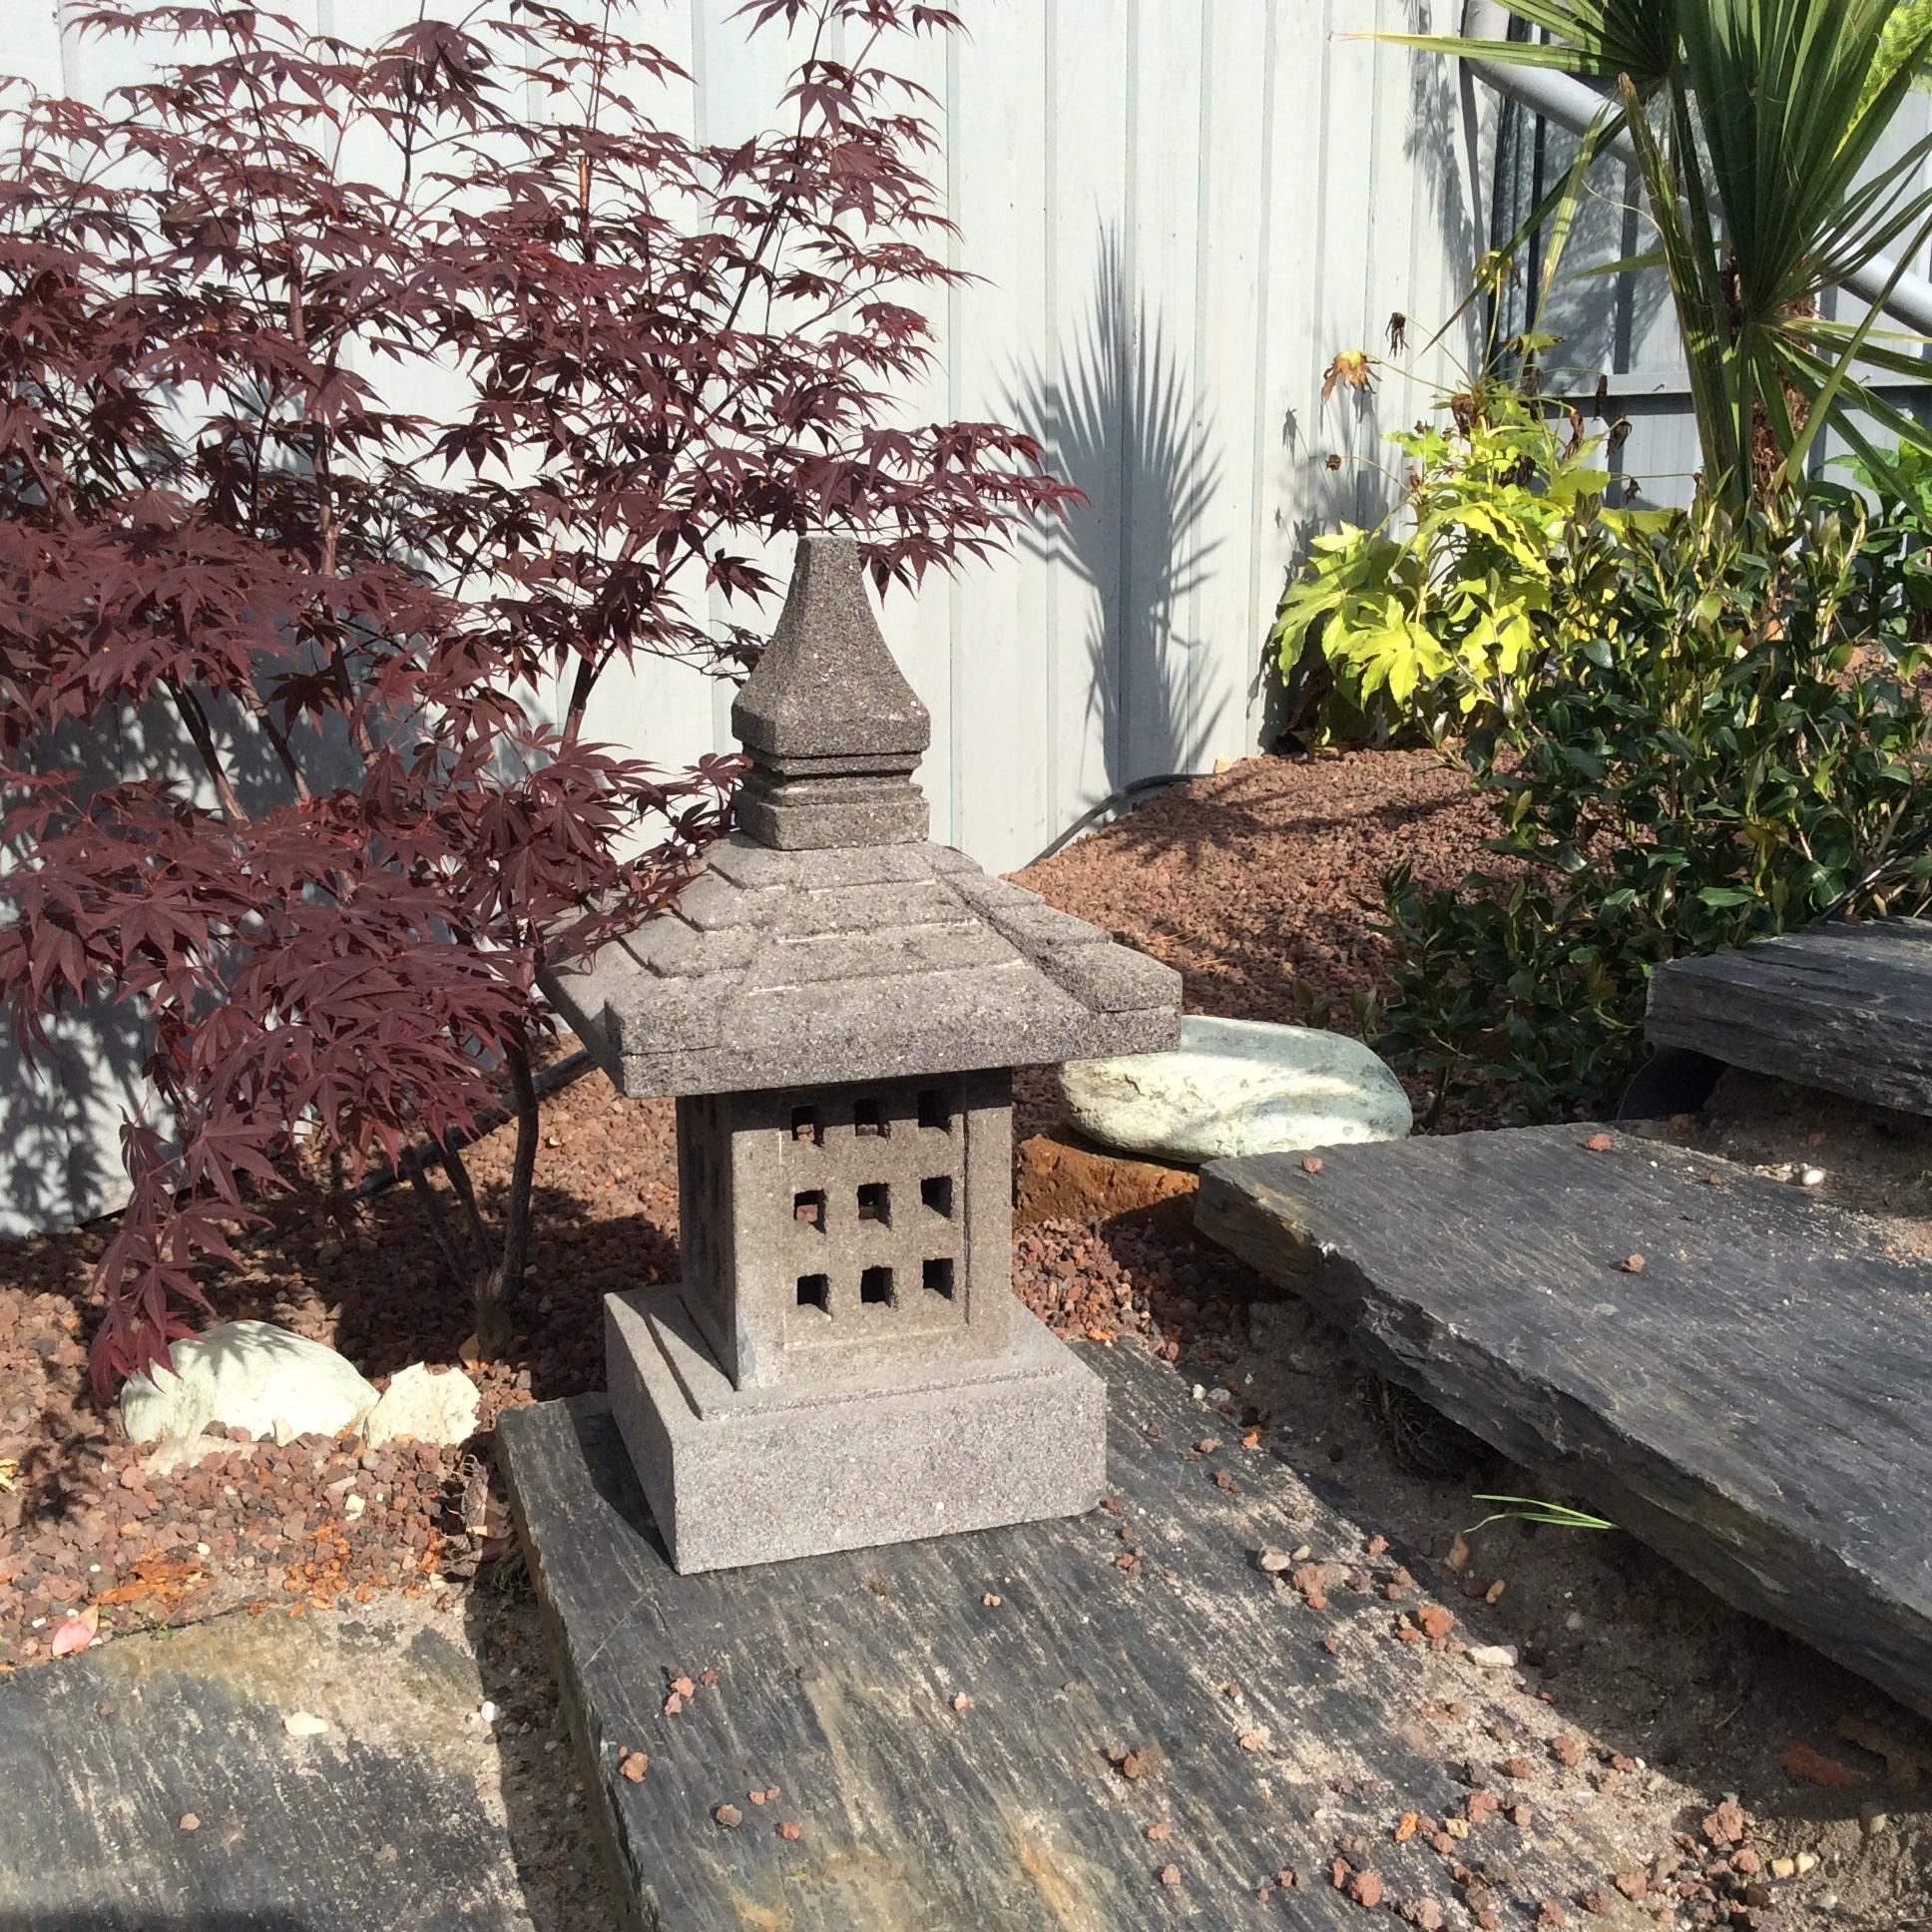 lampe jardin lanterne japonaise en pierre de lave 55 cm nara. Black Bedroom Furniture Sets. Home Design Ideas